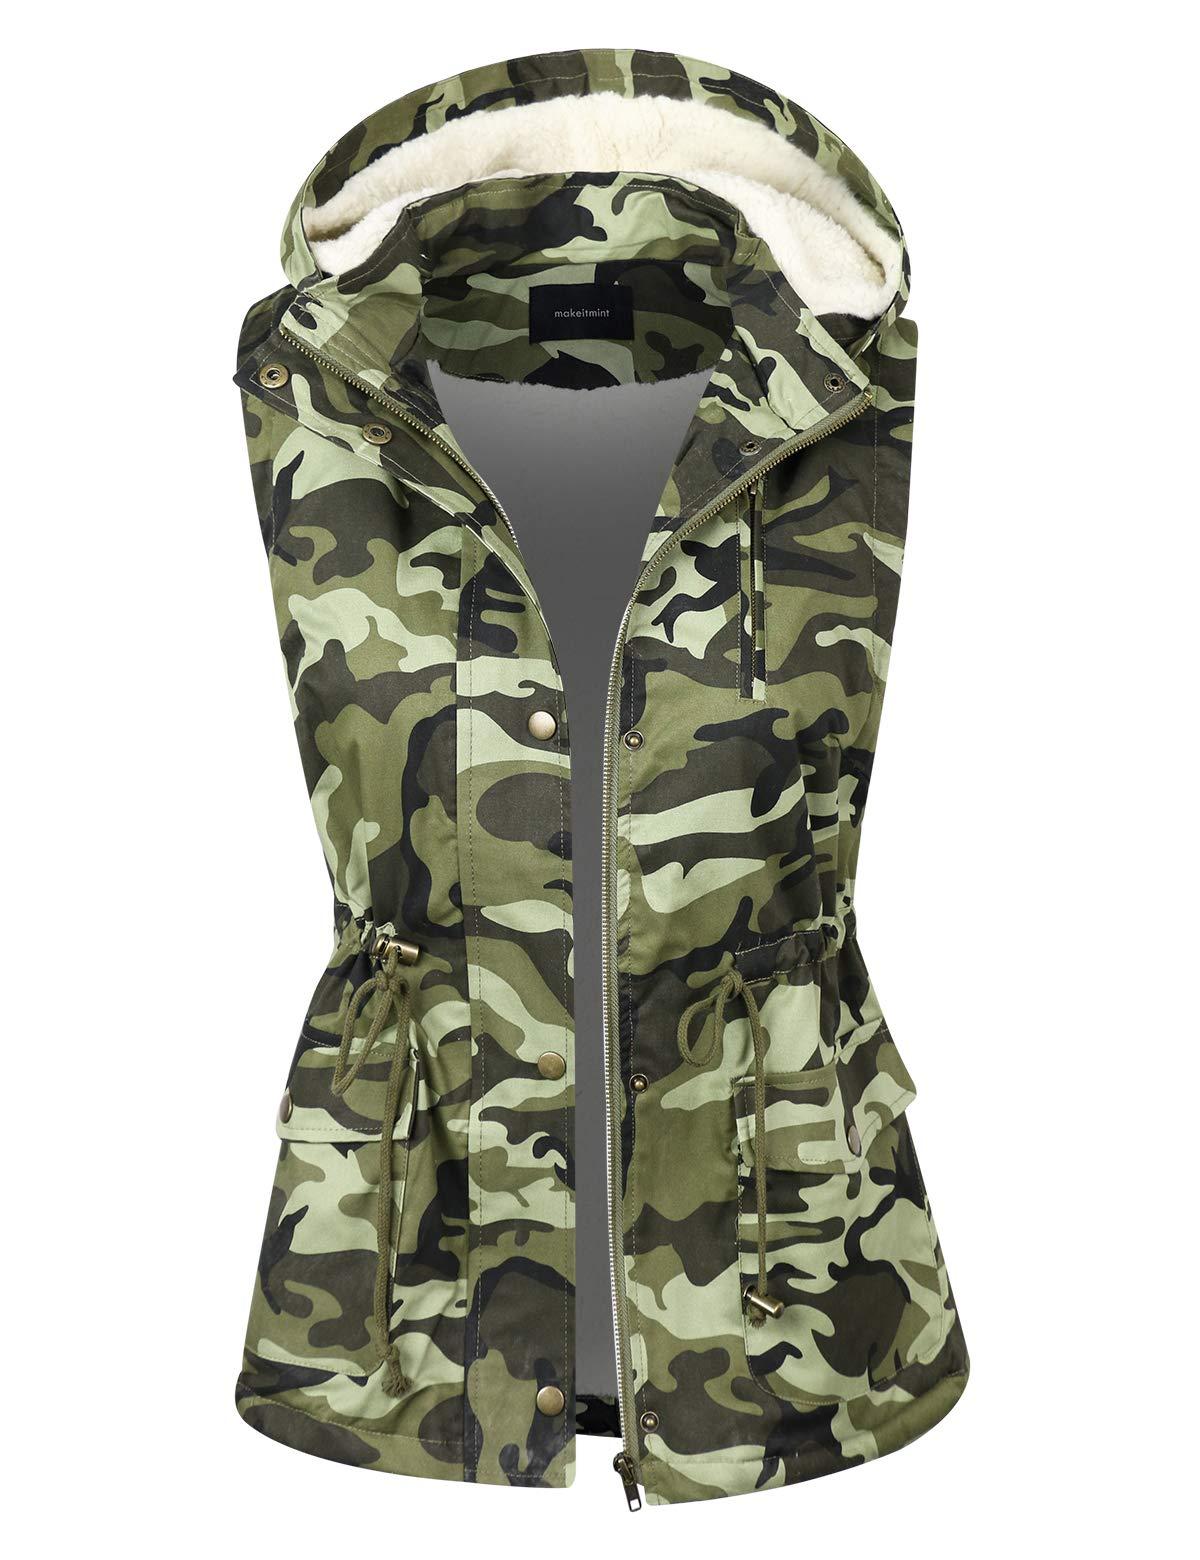 makeitmint Women's Detachable Hoodie Sherpa Lining Camouflage Anorak Jacket Vest YJV0053-CAMO-MED by makeitmint